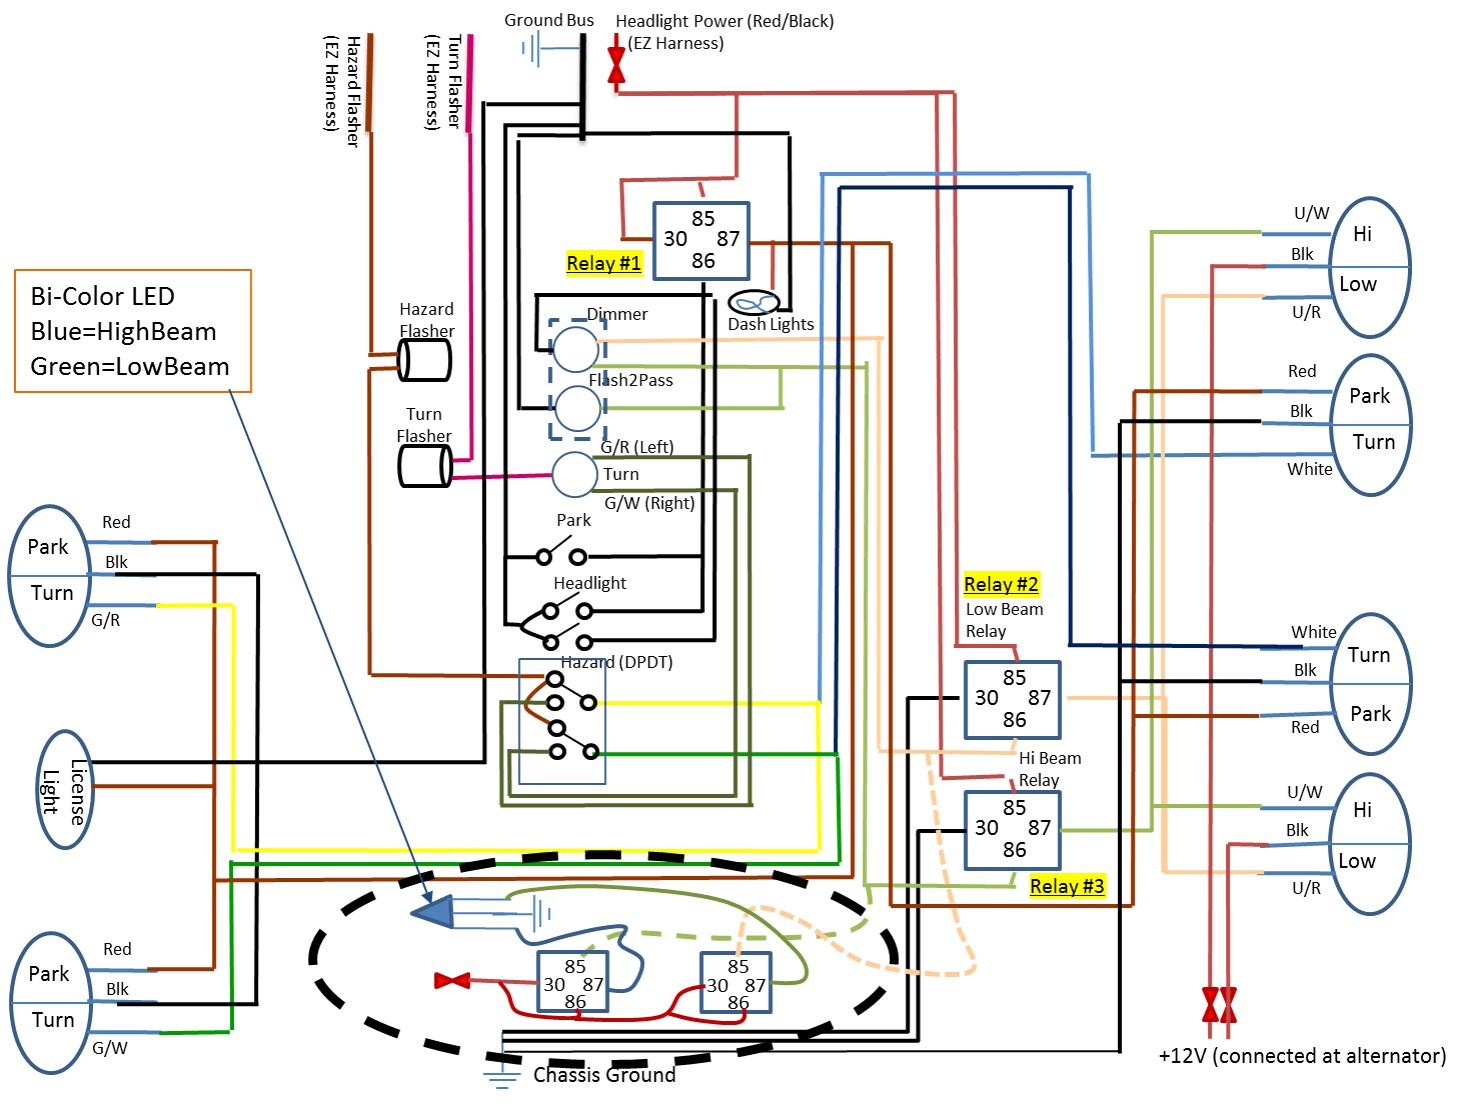 [SCHEMATICS_48IU]  DIAGRAM> Msd Ignition Box Wiring Diagram FULL Version HD Quality Wiring  Diagram - VENNDIAGRAMR.ANEMONELAB.IT | Fast Wiring Diagram |  | Diagram Database - anemonelab